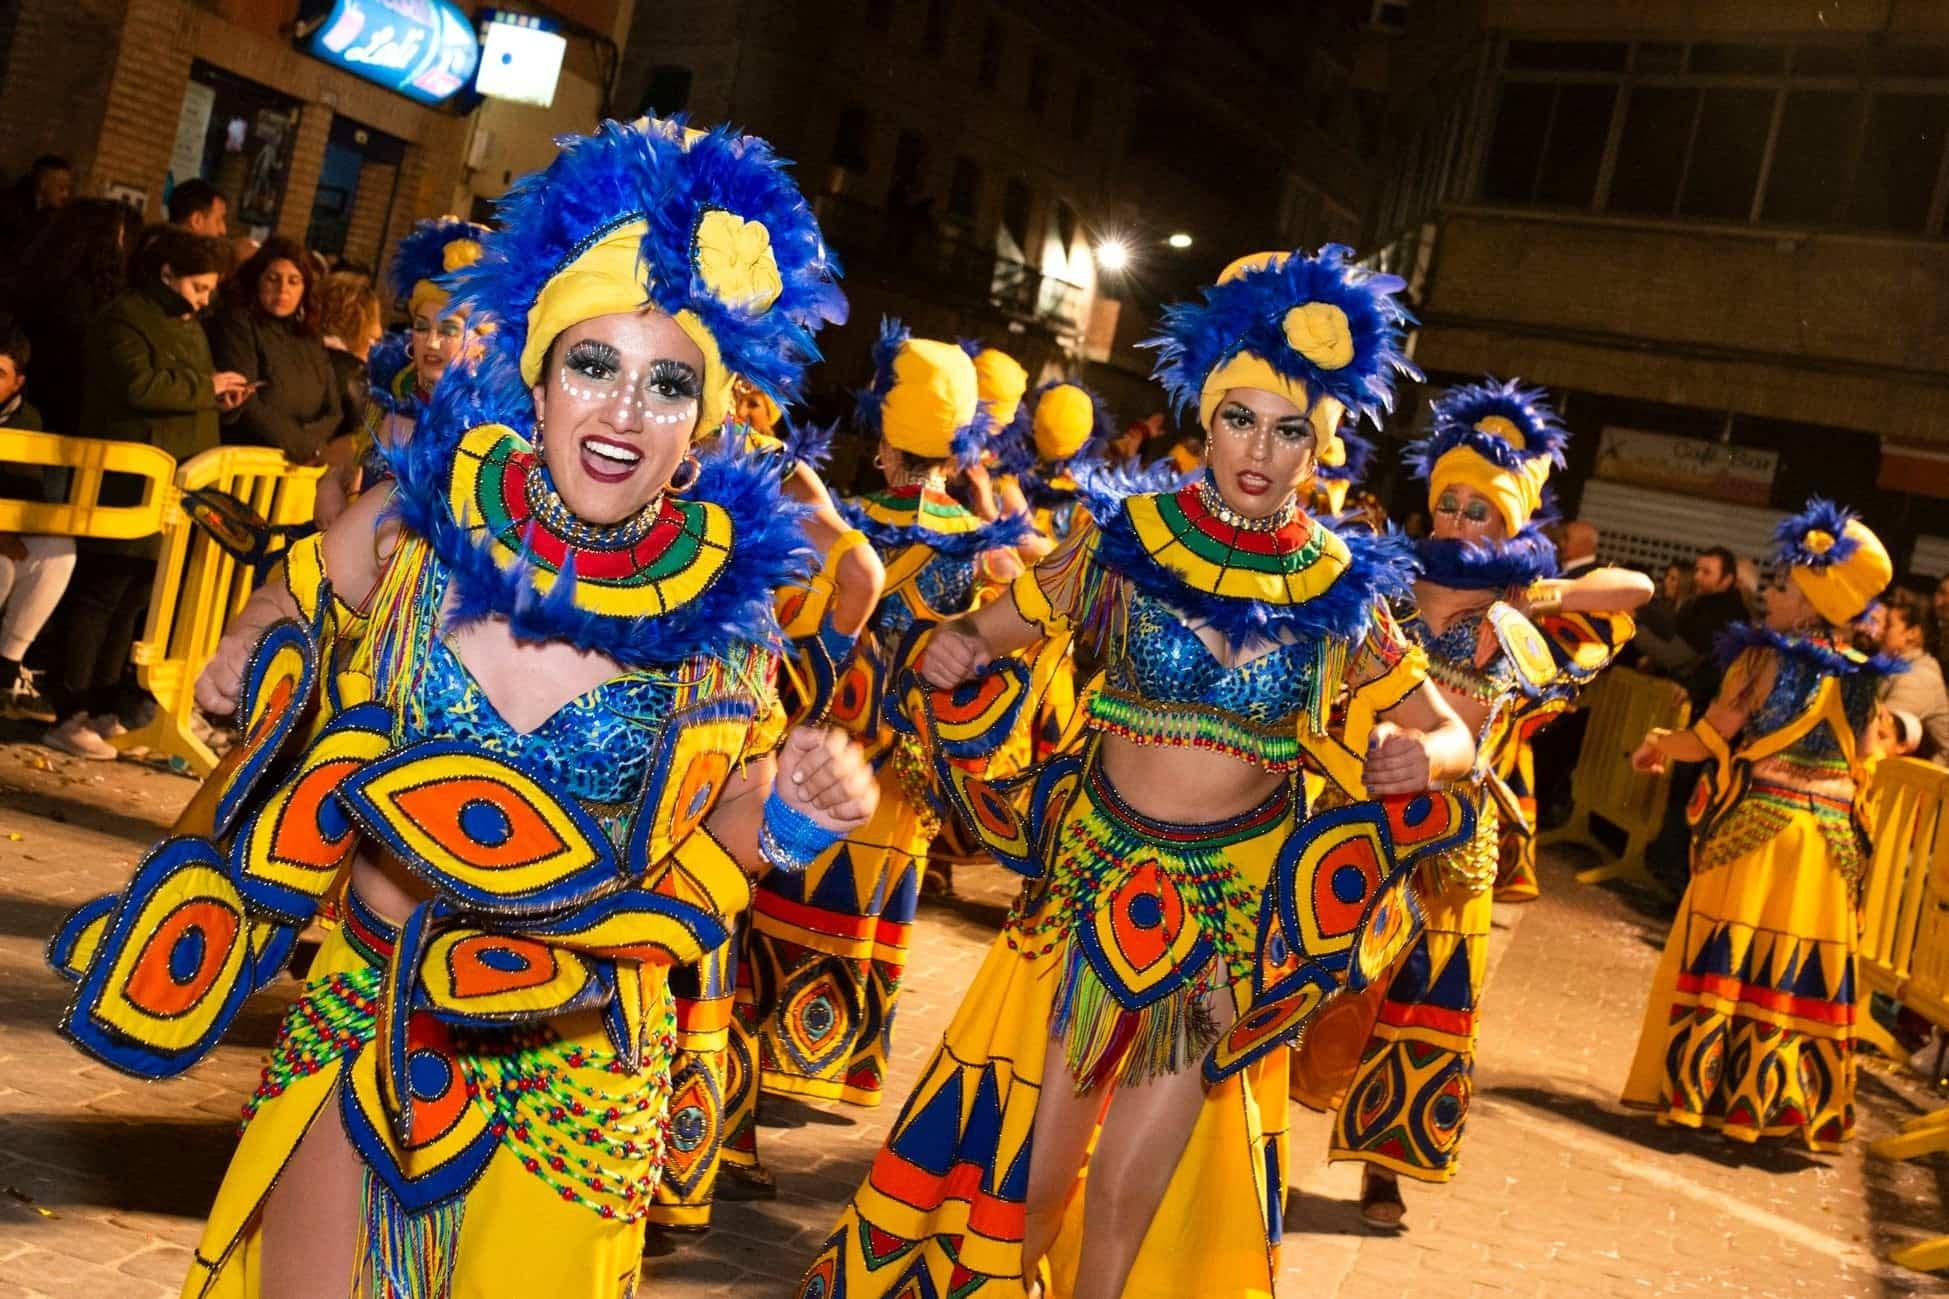 Carnaval de herencia 2020 ofertorio 40 - Selección de fotografías del Ofertorio del Carnaval de Herencia